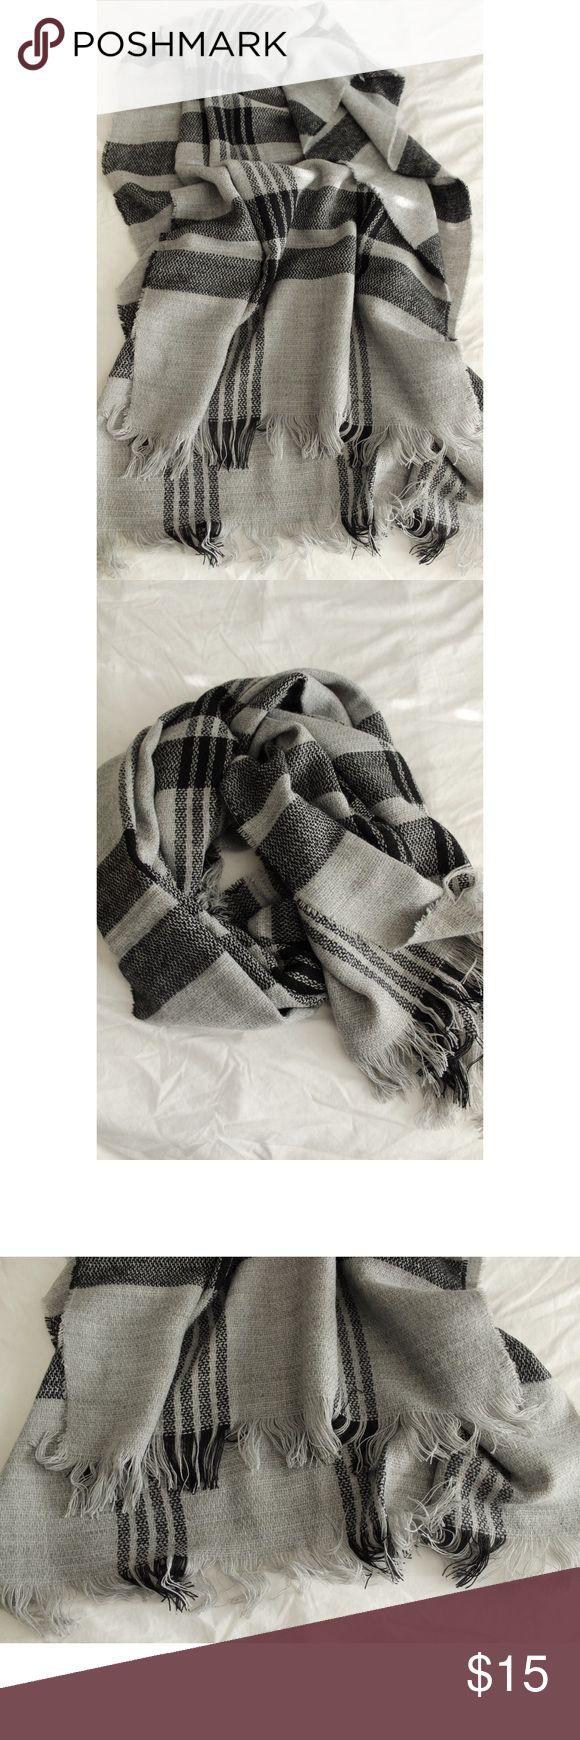 Best 25+ Pashmina scarf ideas on Pinterest | Fulares con ...